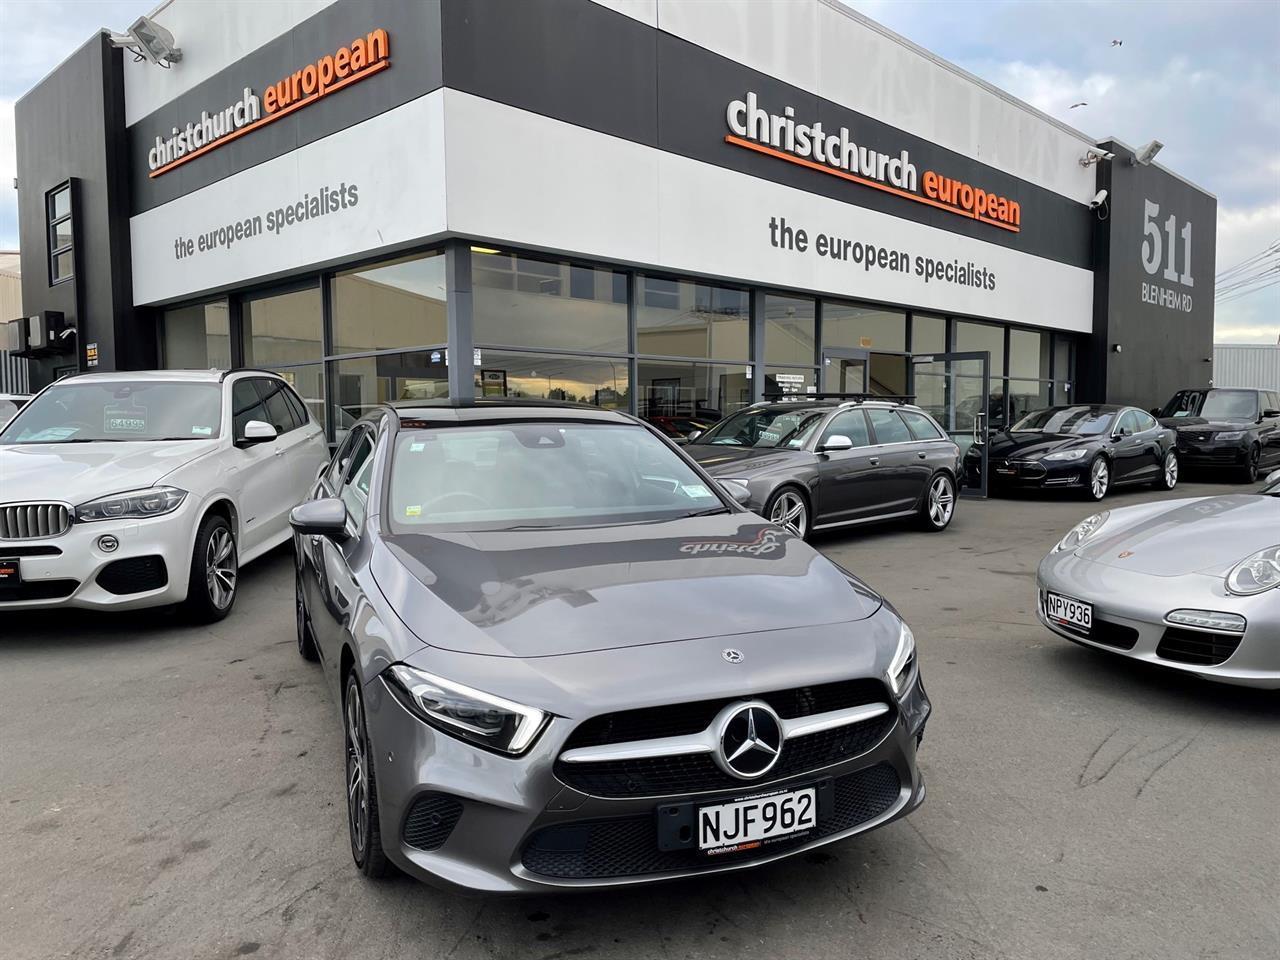 image-1, 2019 MercedesBenz A180 1.3T 7 Speed New Model at Christchurch